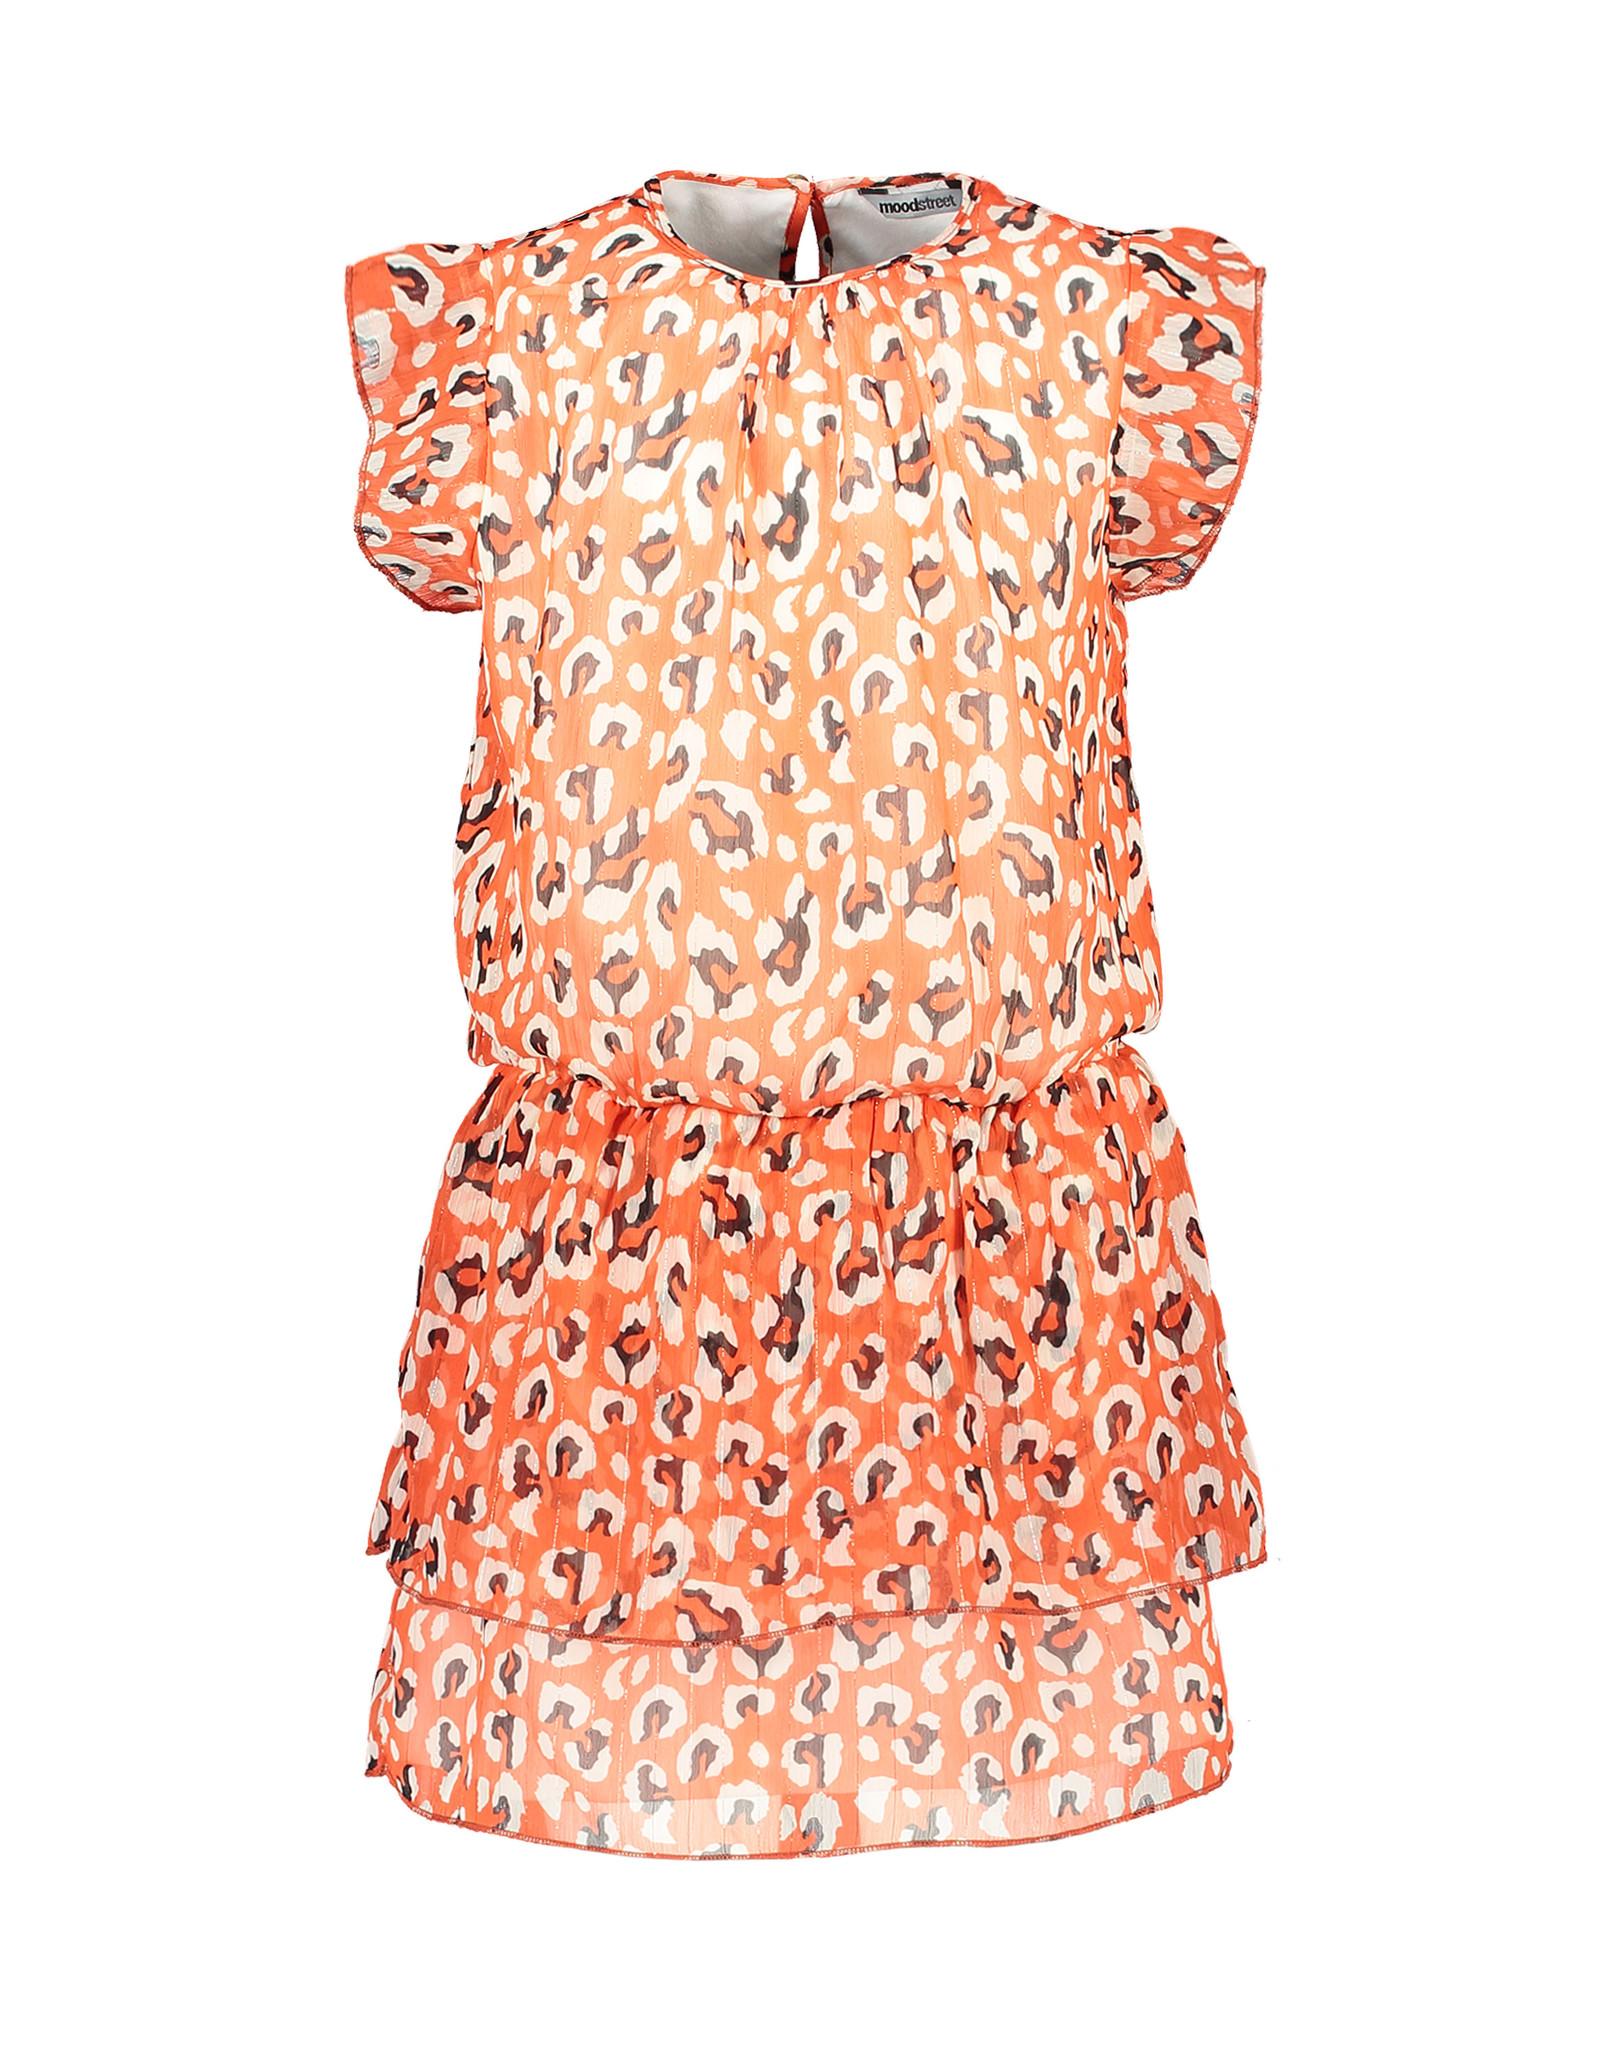 Moodstreet MT AO animal dress, Red